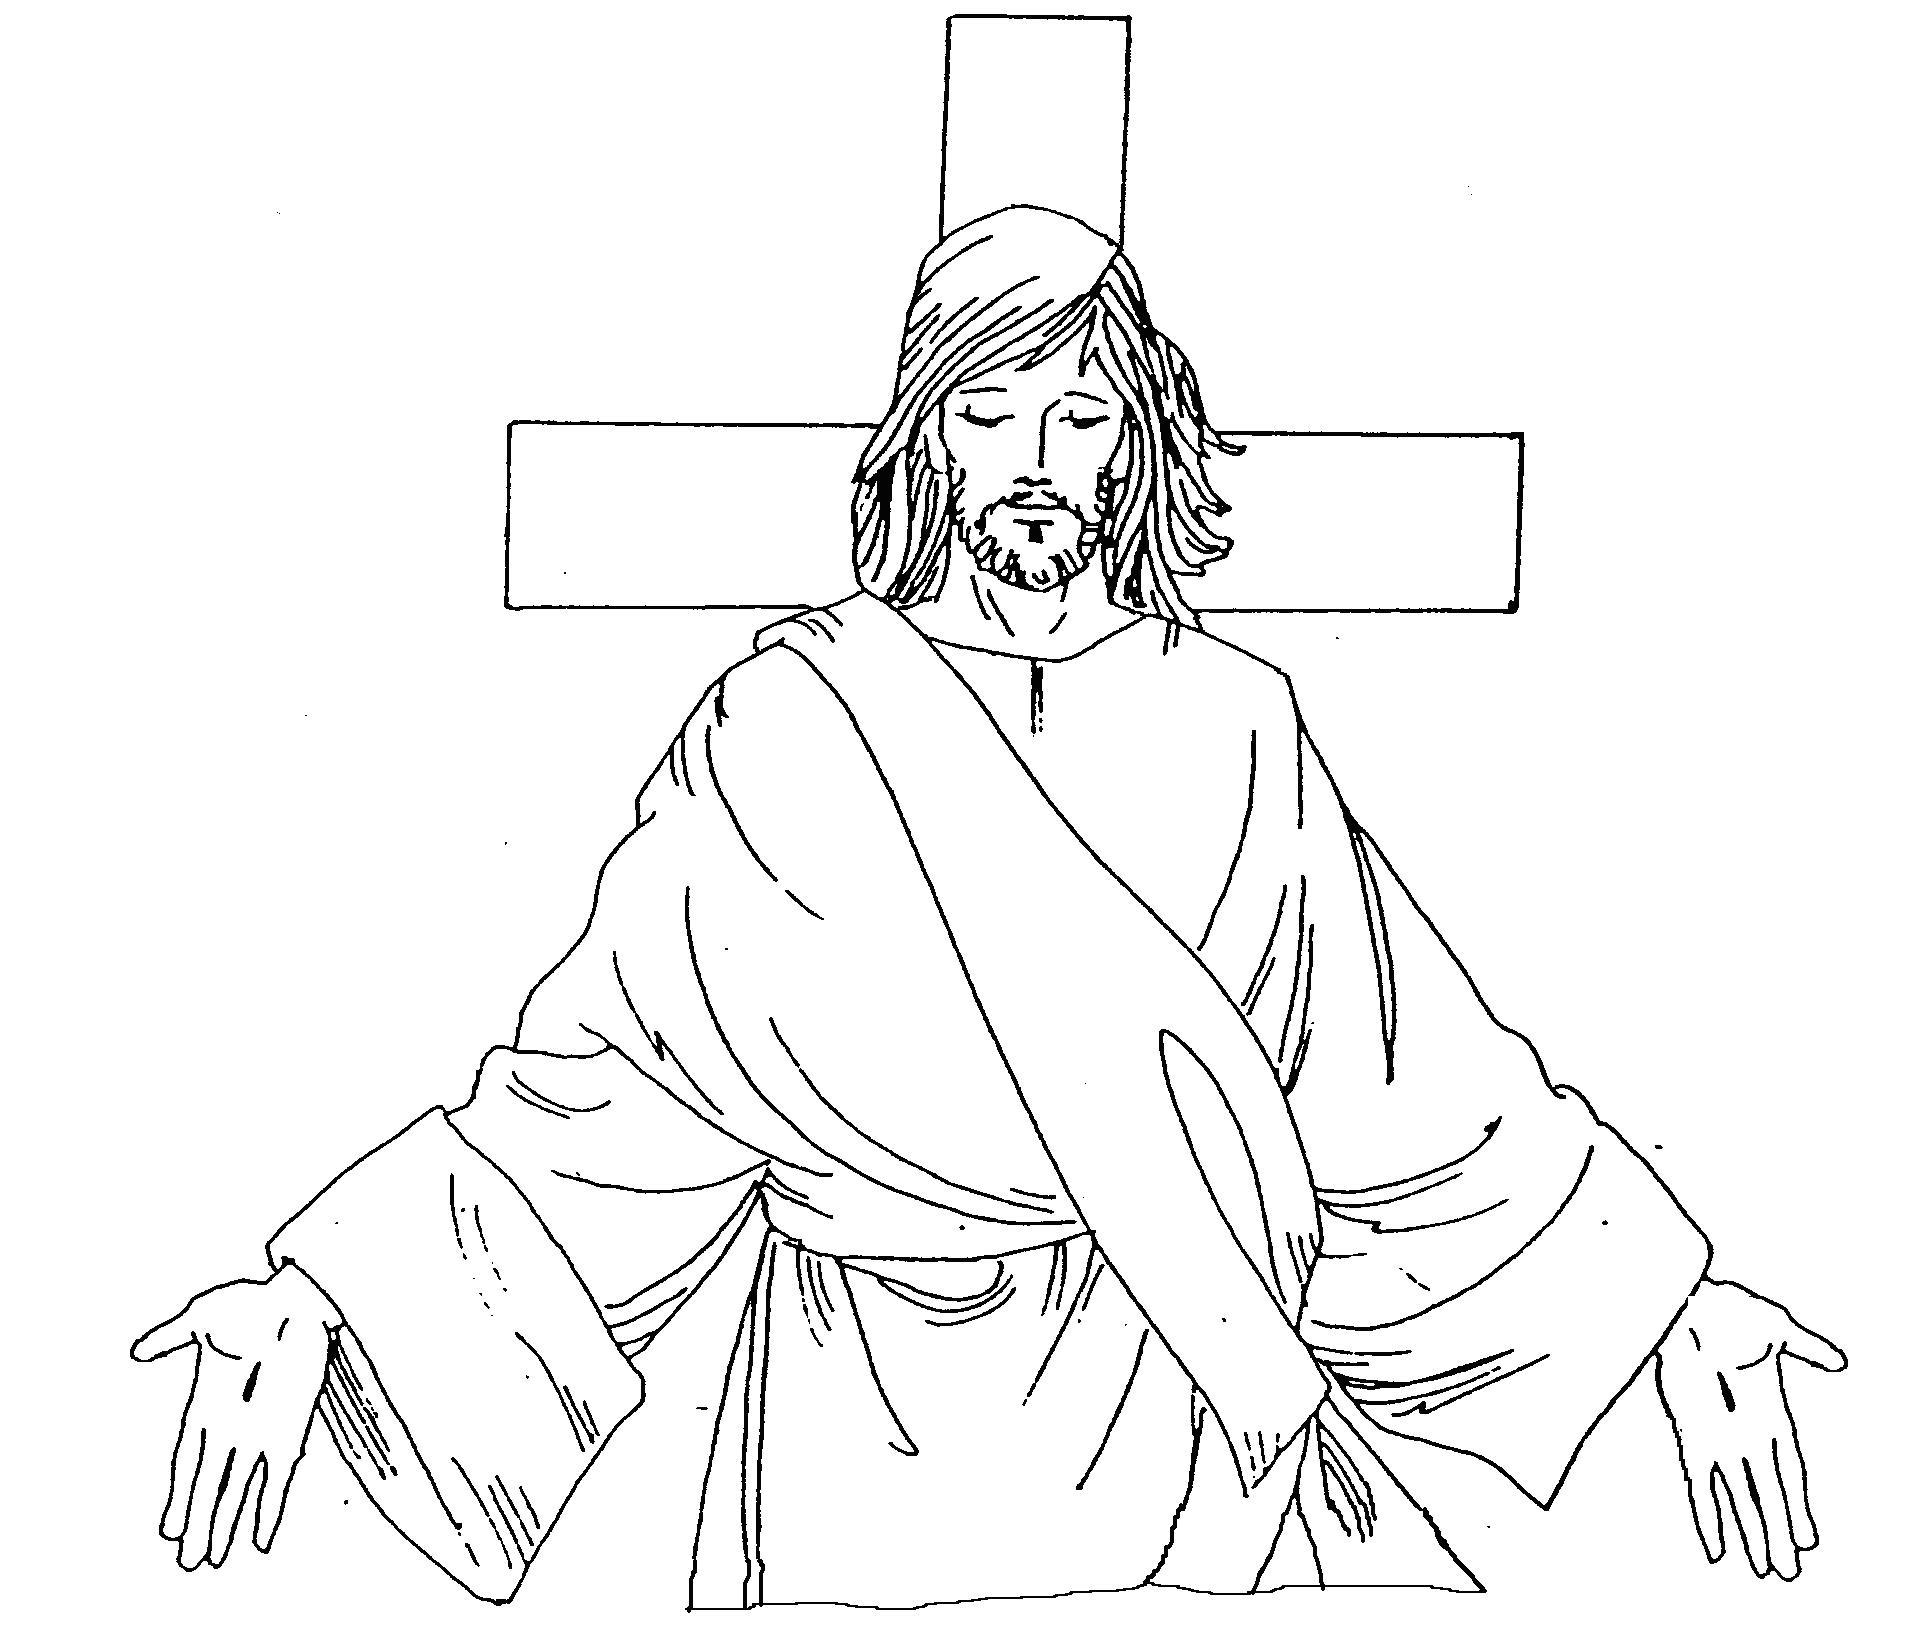 abc catholic coloring pages - photo#25